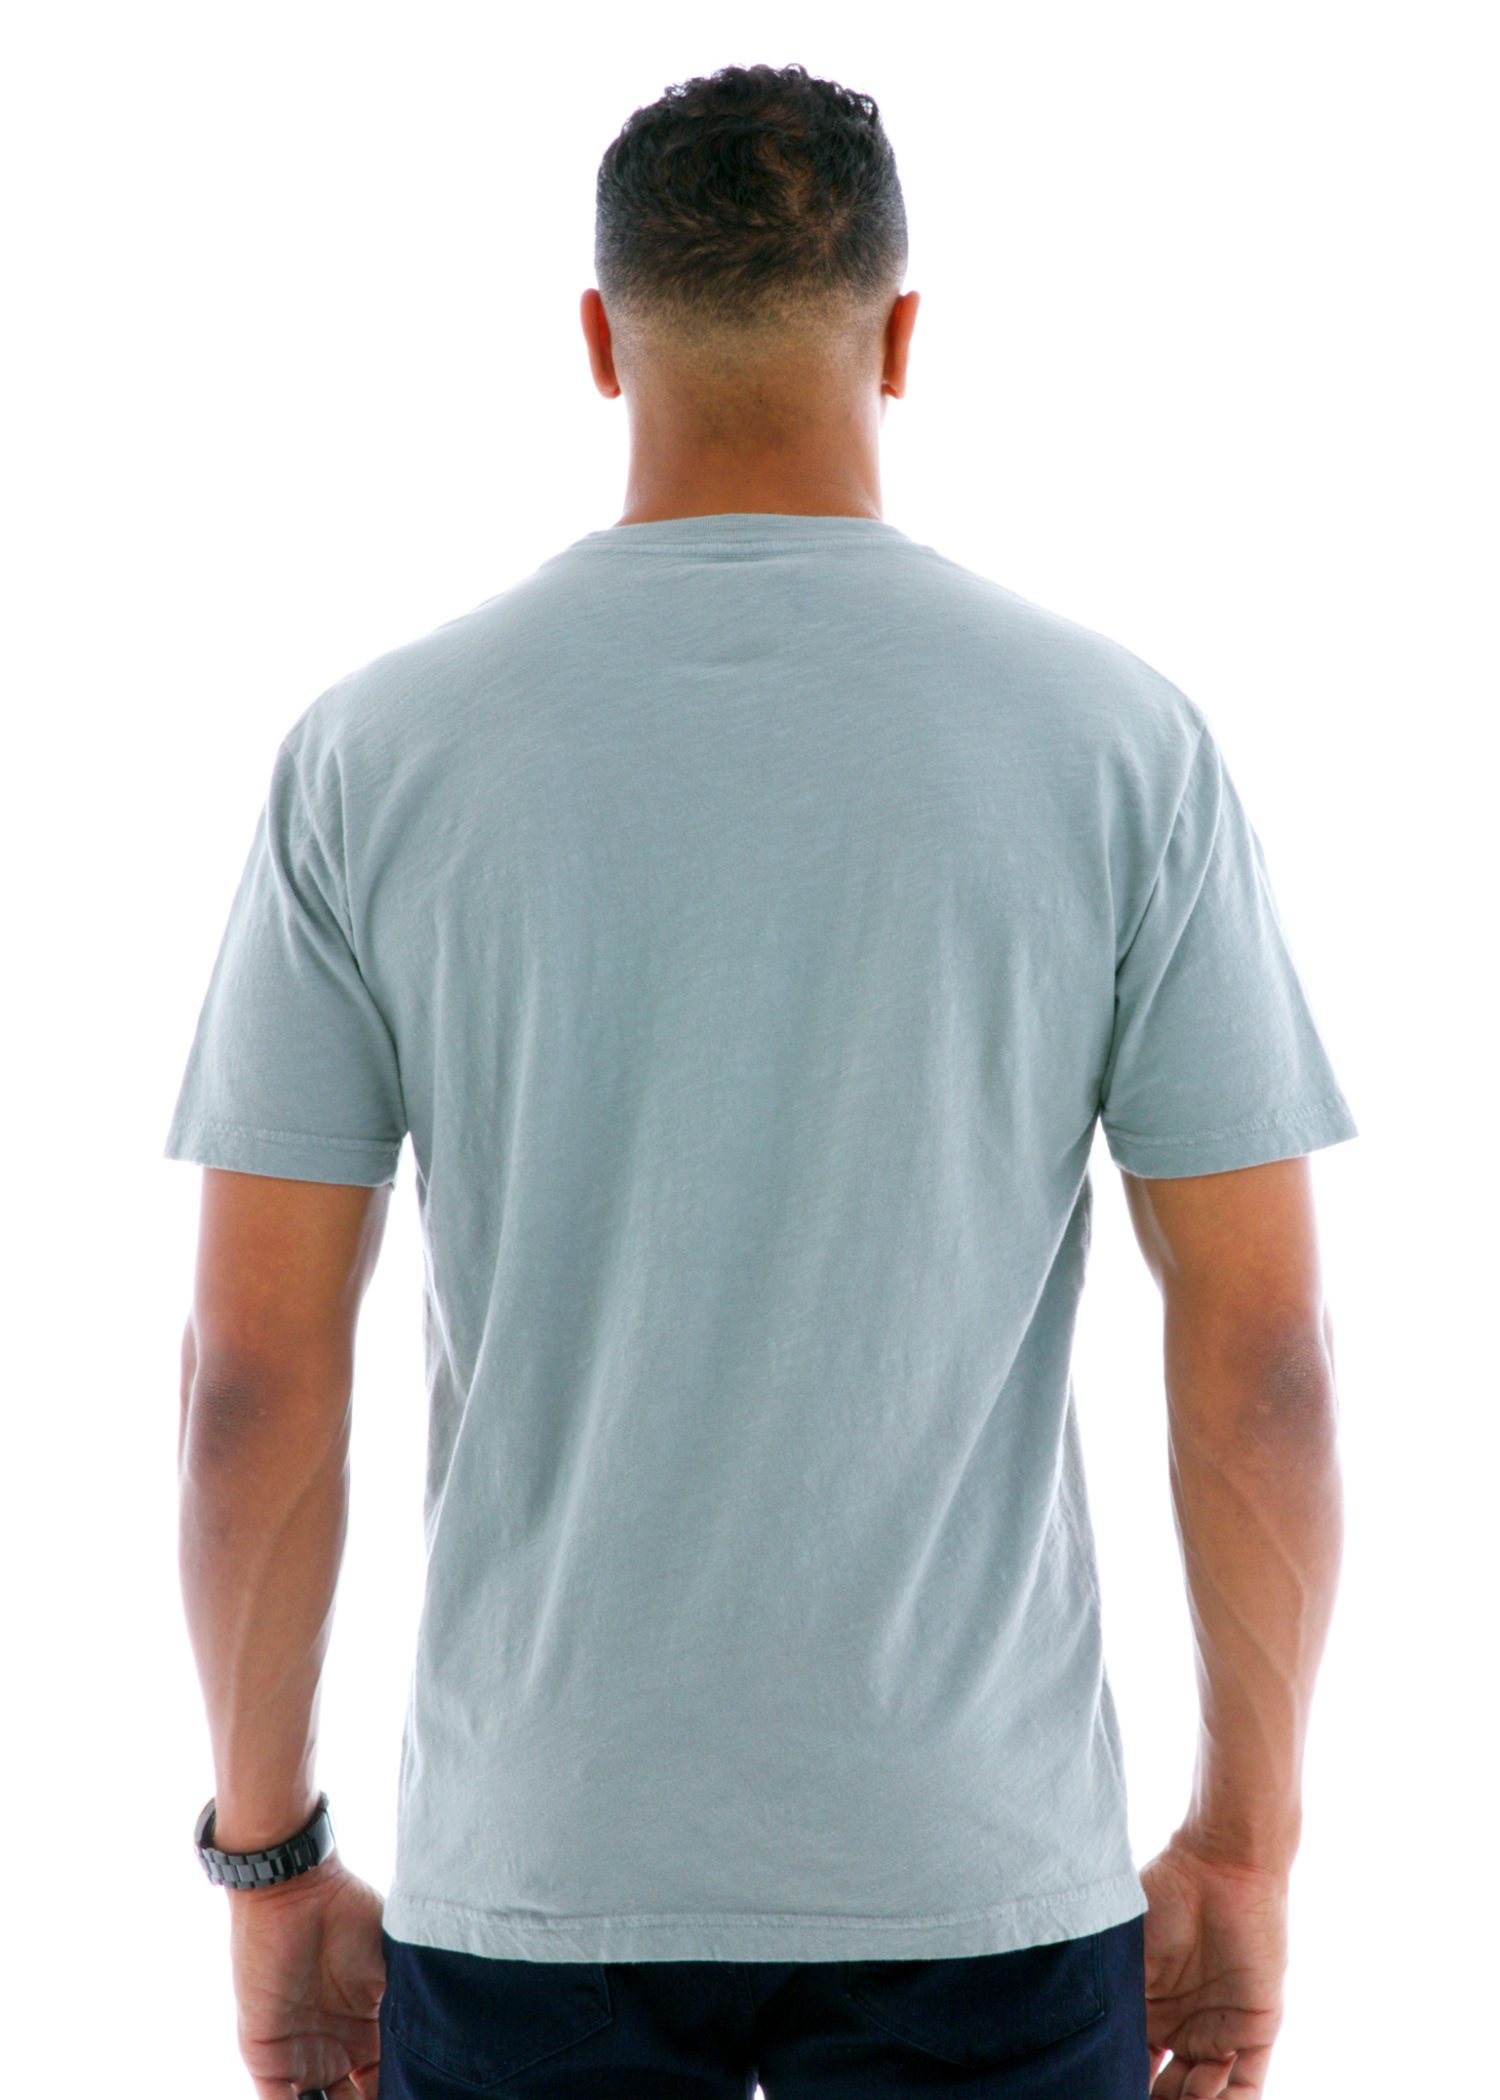 Slub Jersey Short Sleeve T-Shirt Back View